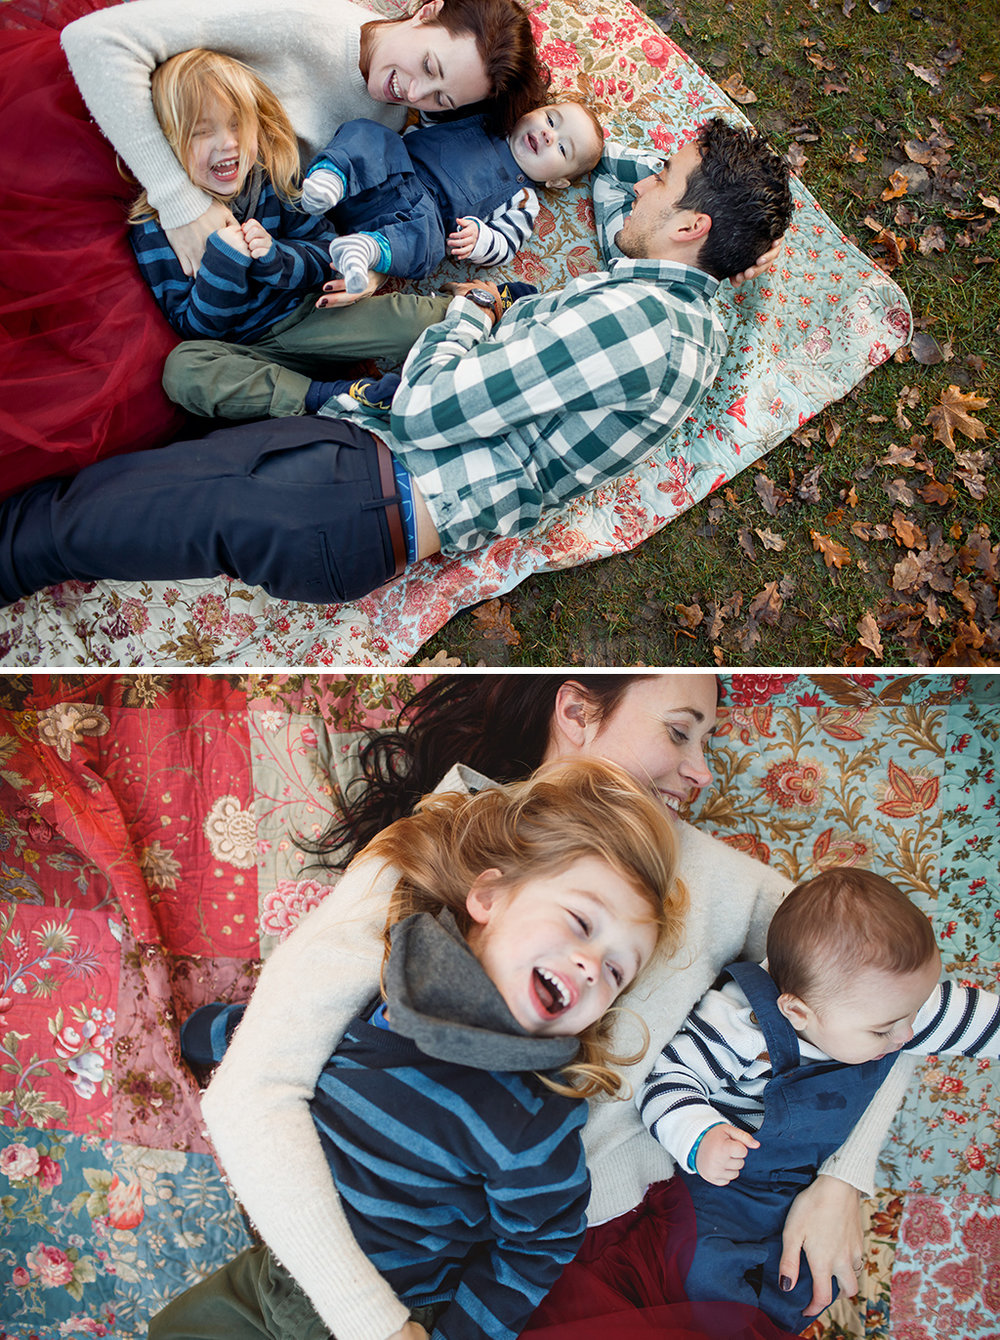 Hostfotografering-i-november-familjefotografering-Stockholm-11.jpg